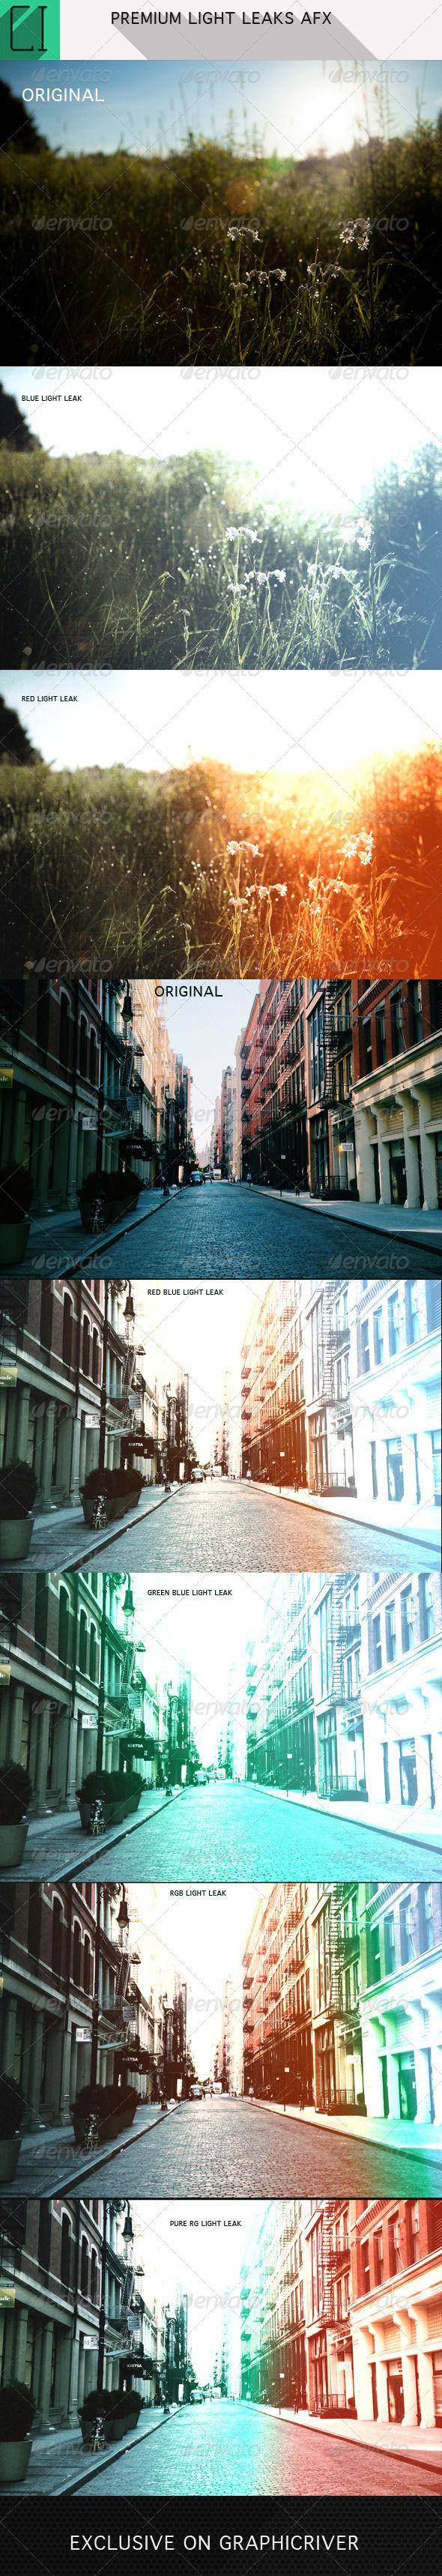 Premium light leaks photoshop afx